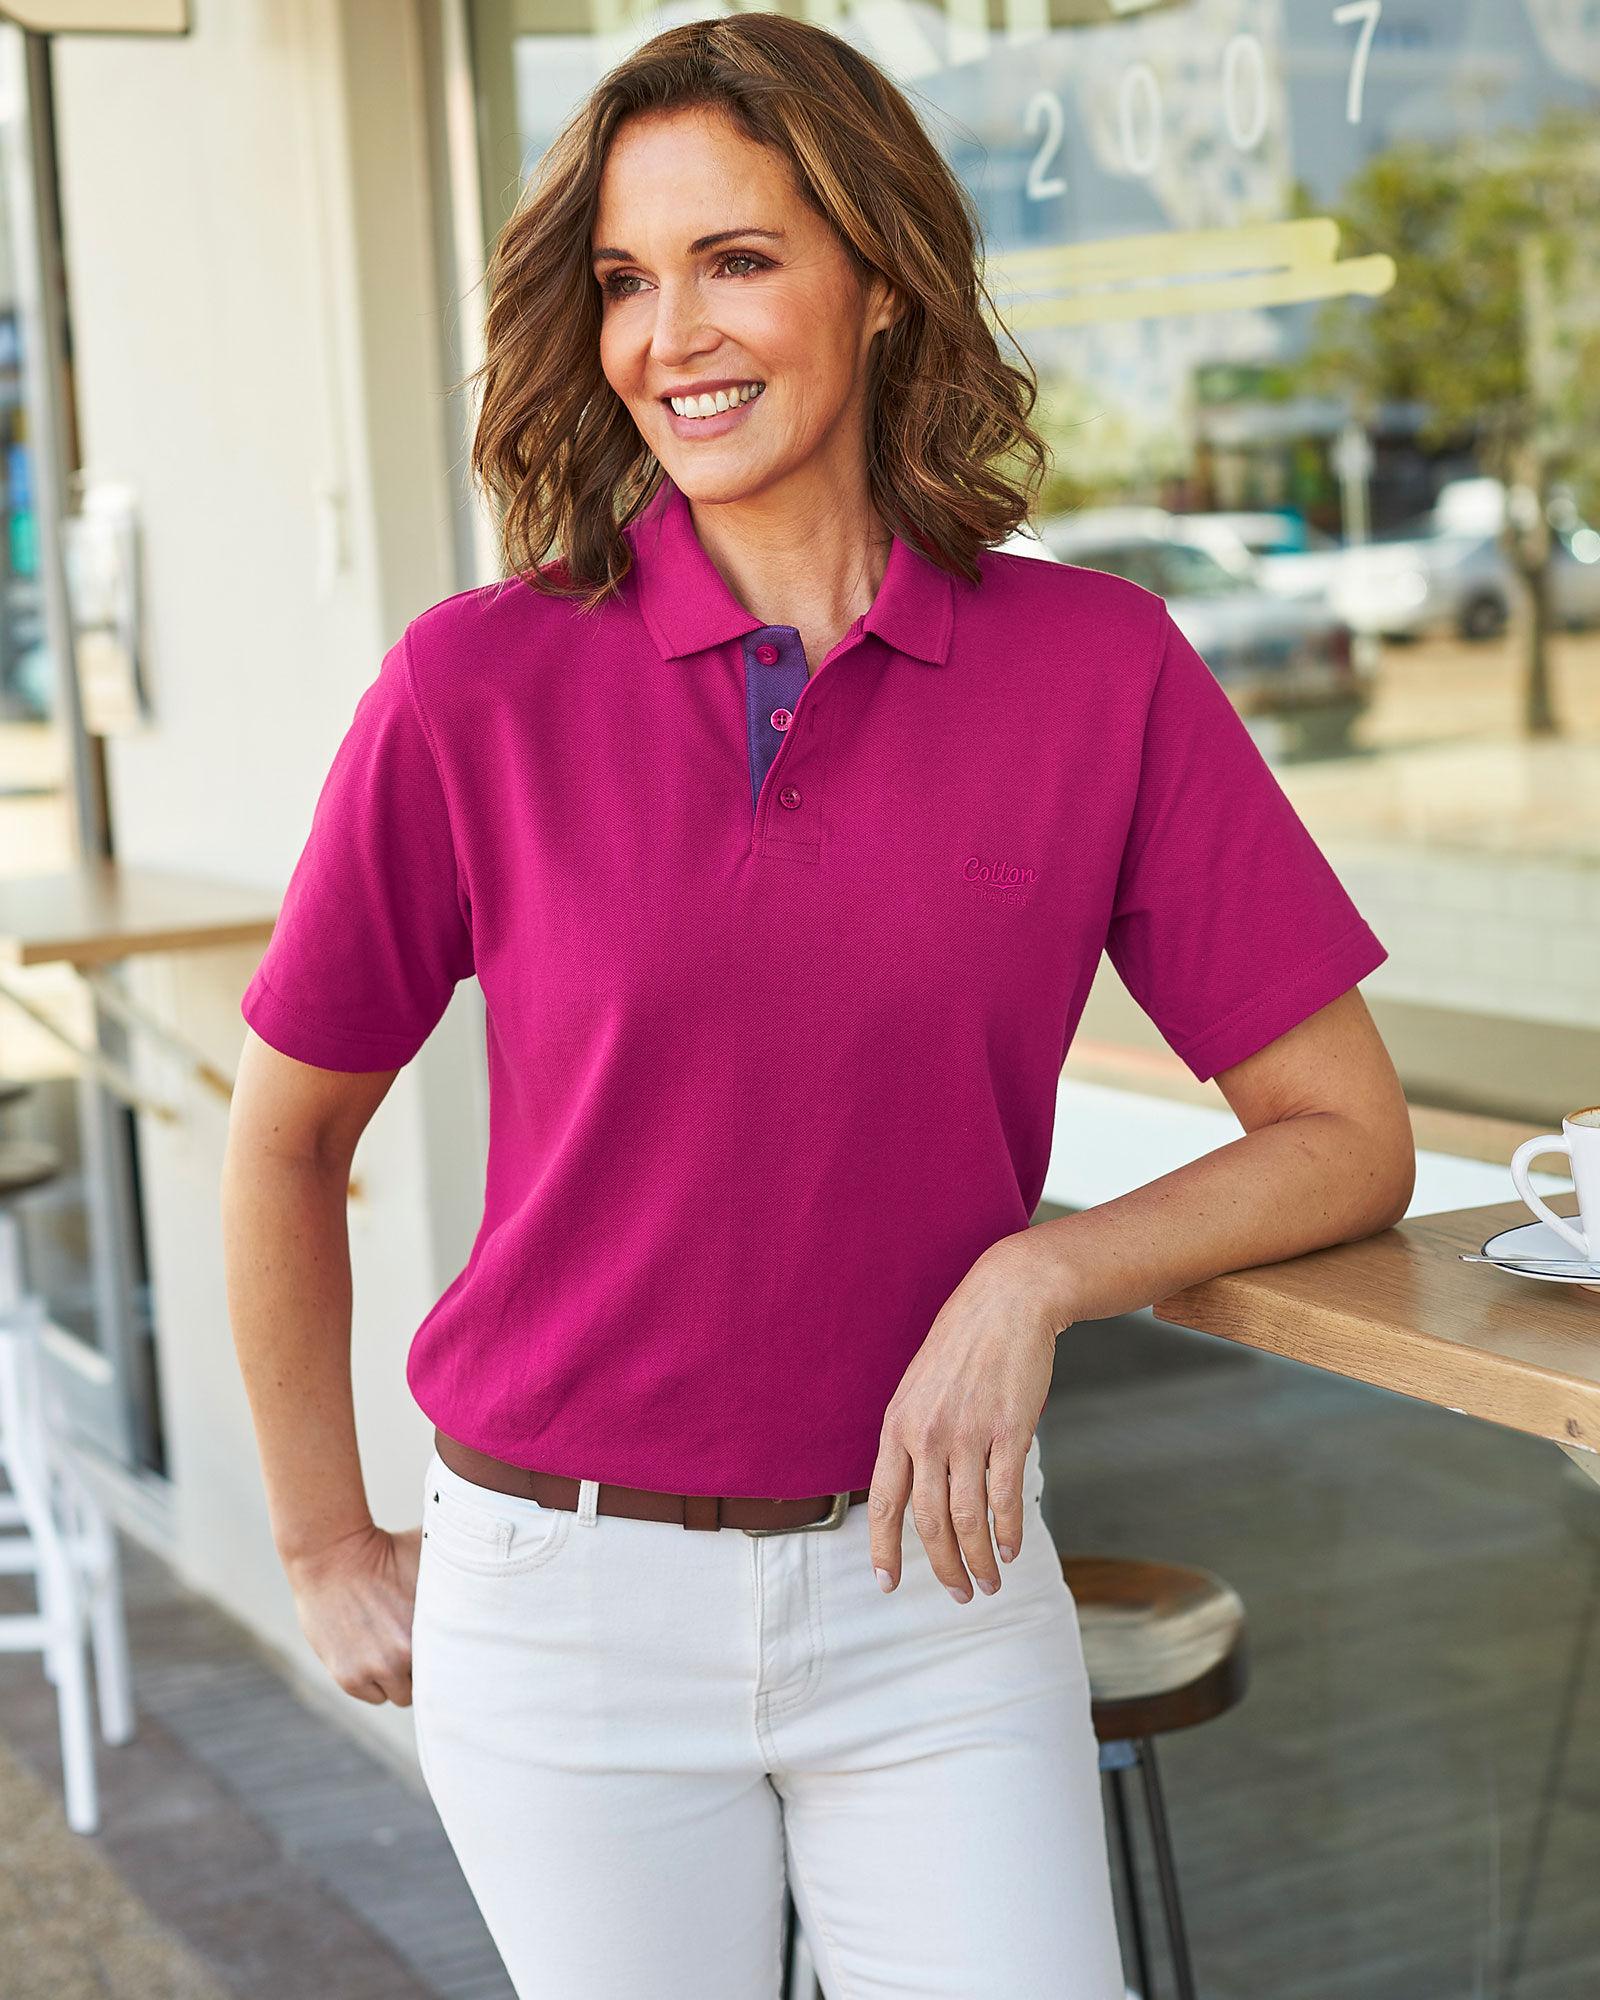 Women's Polo Shirts | Polo Shirts For Women - Cotton Traders